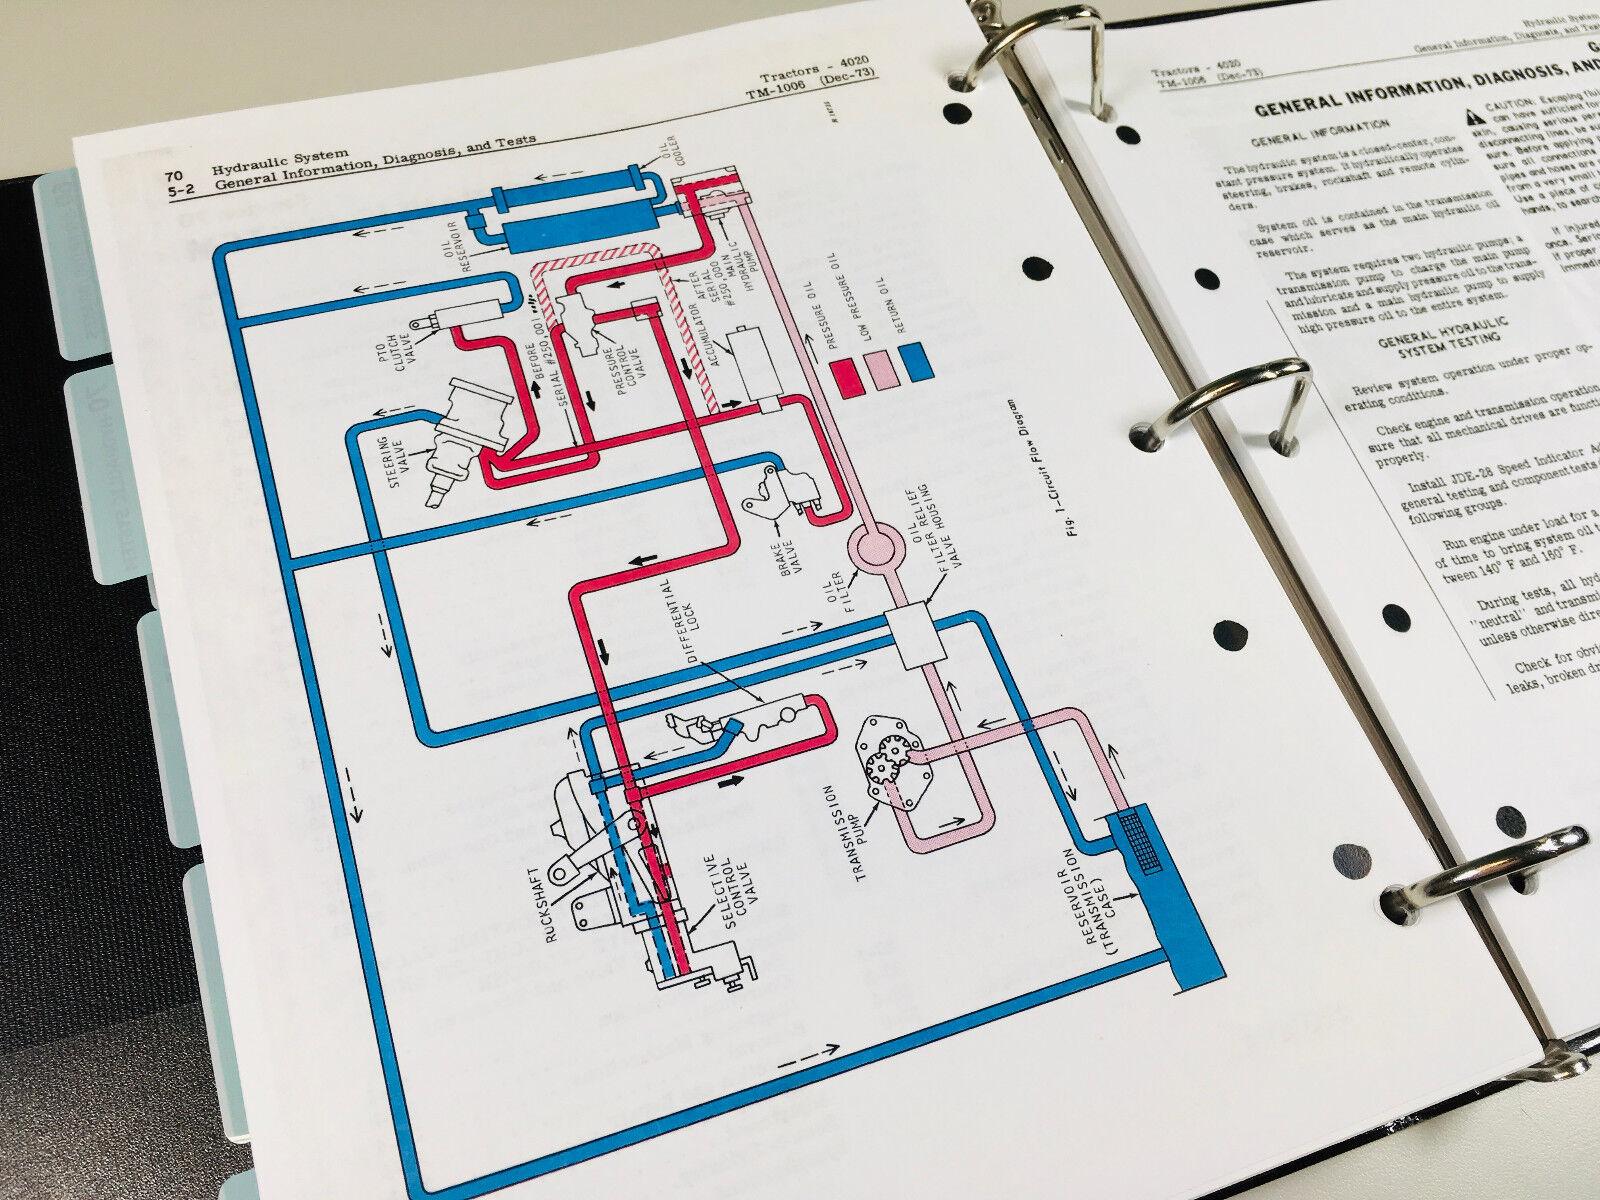 Service Manual Set For John Deere 4020 4000 Tractor